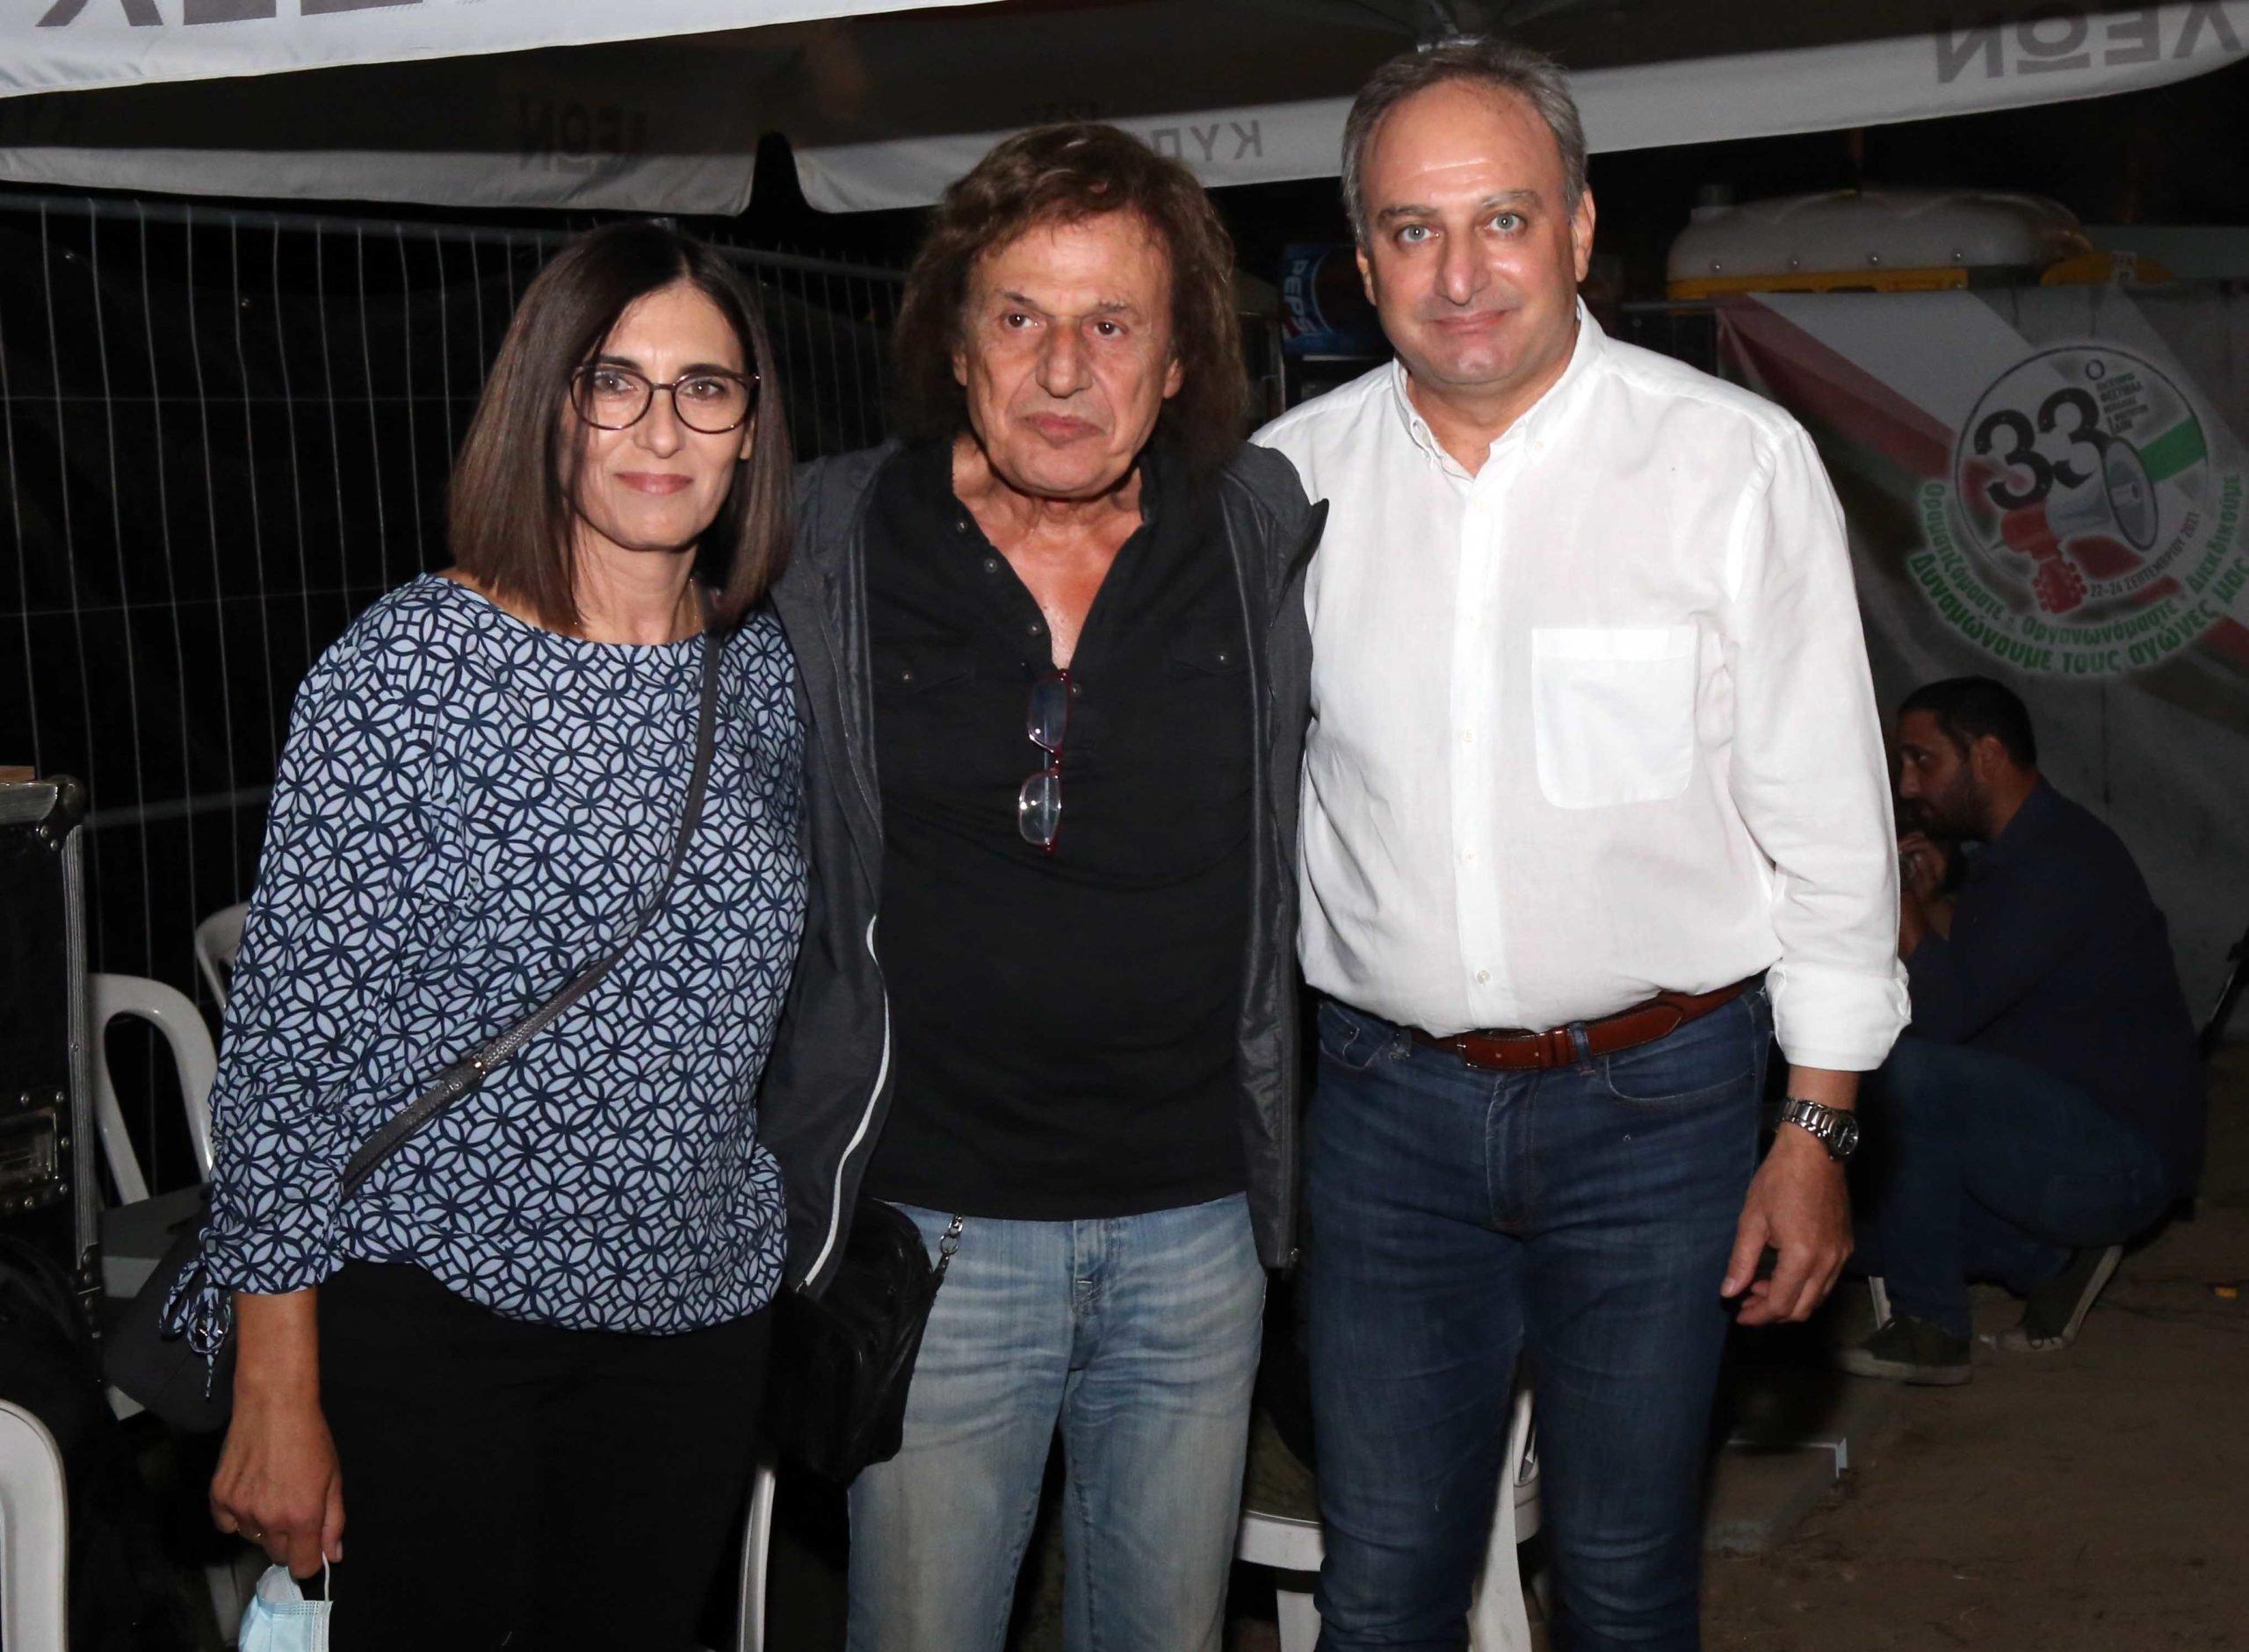 Festival Edon Stefanou Papakonstantinou 6 Scaled